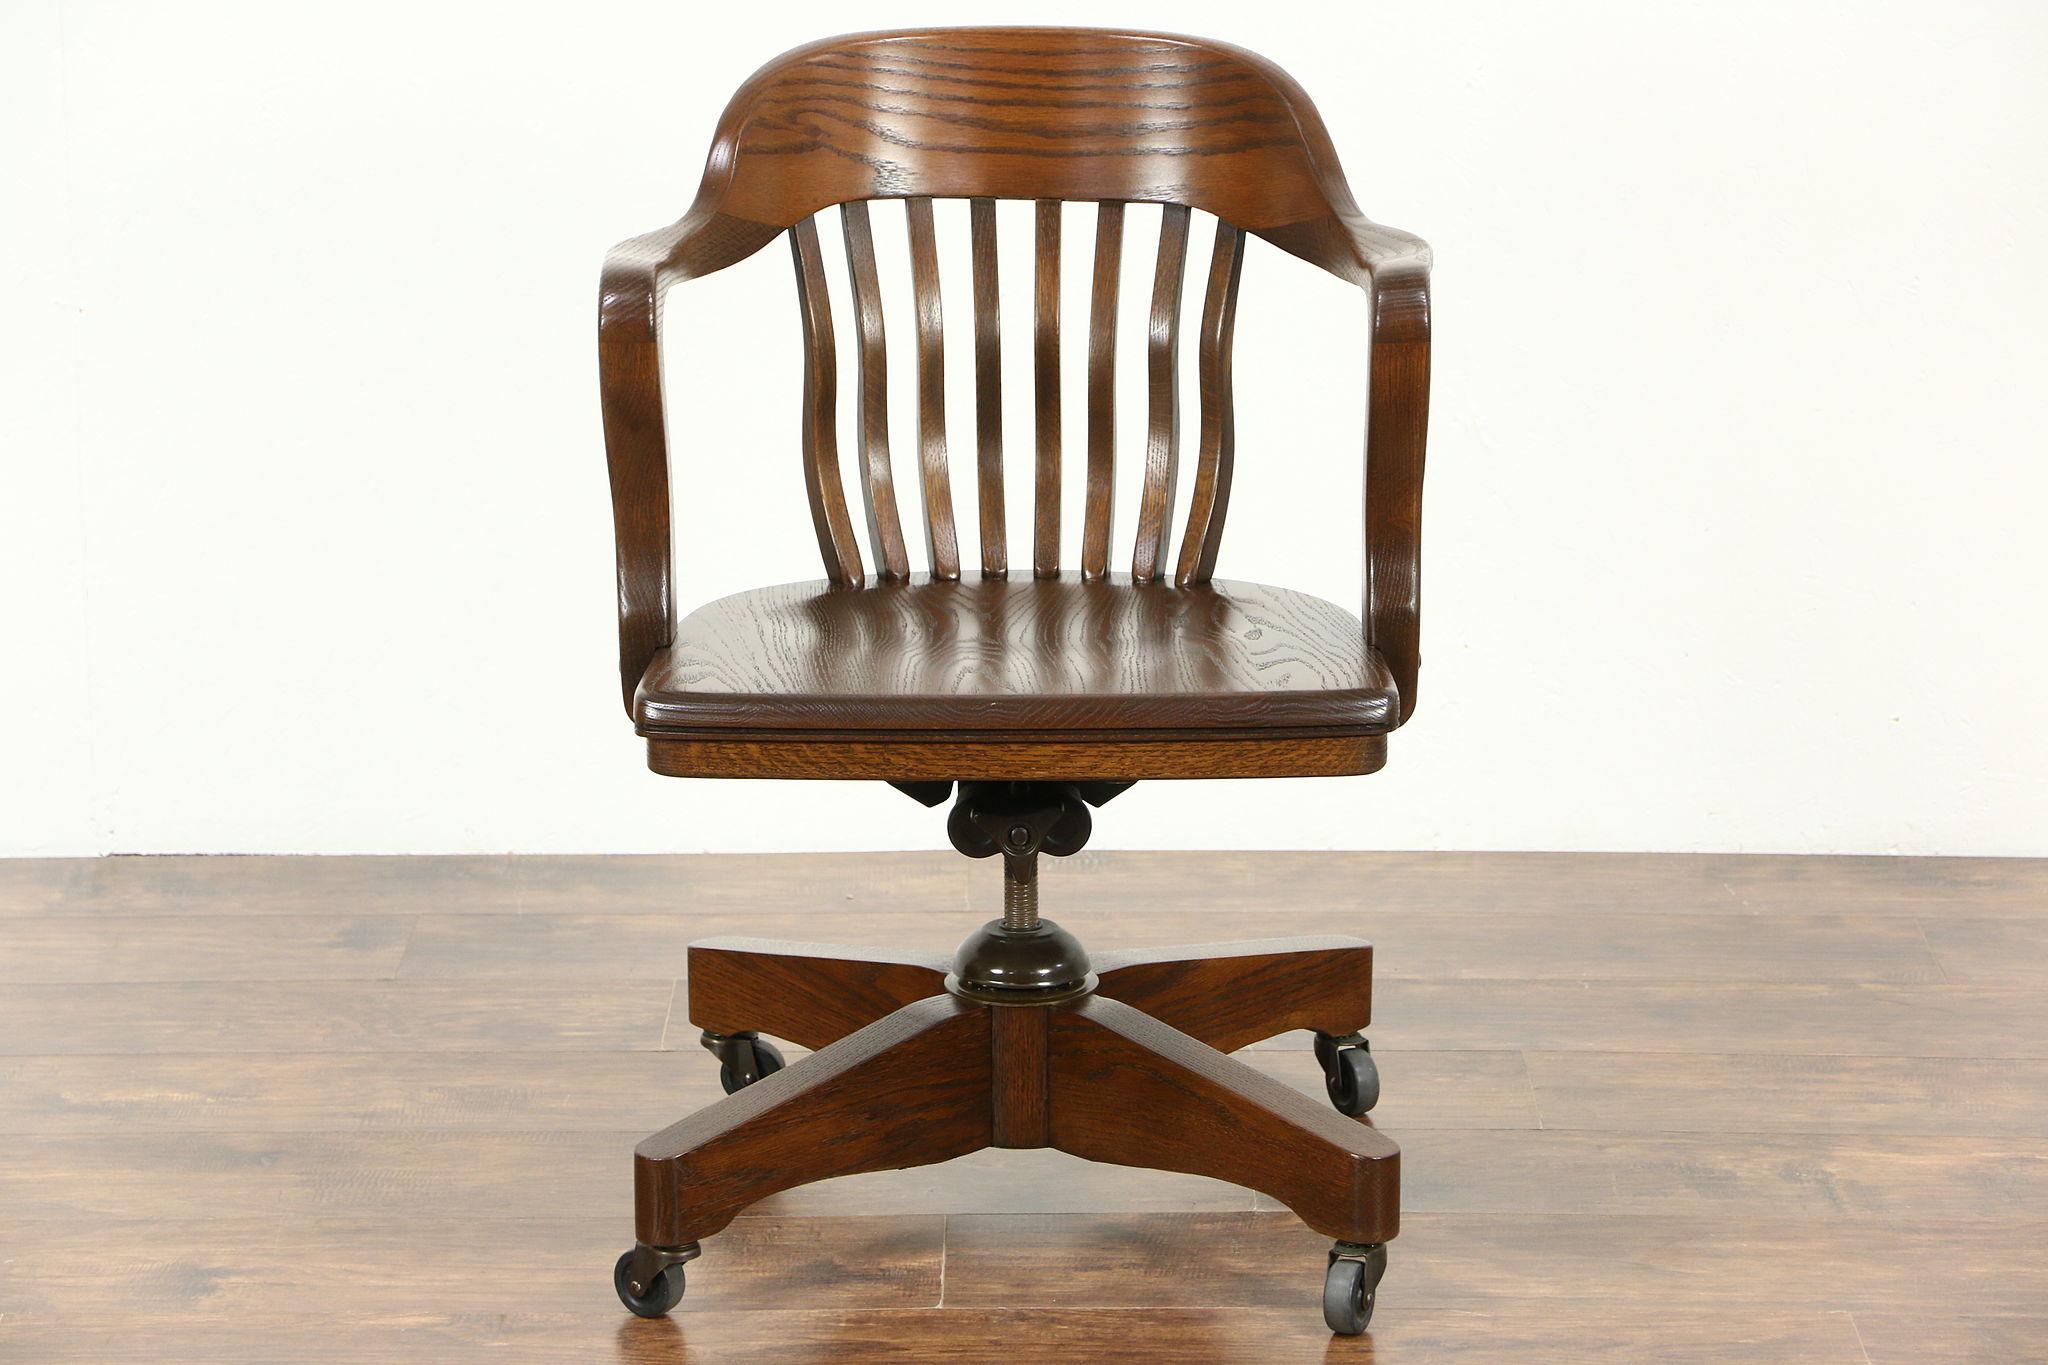 Incredible Oak Swivel Adjustable 1950S Vintage Desk Chair Signed Jasper Unemploymentrelief Wooden Chair Designs For Living Room Unemploymentrelieforg